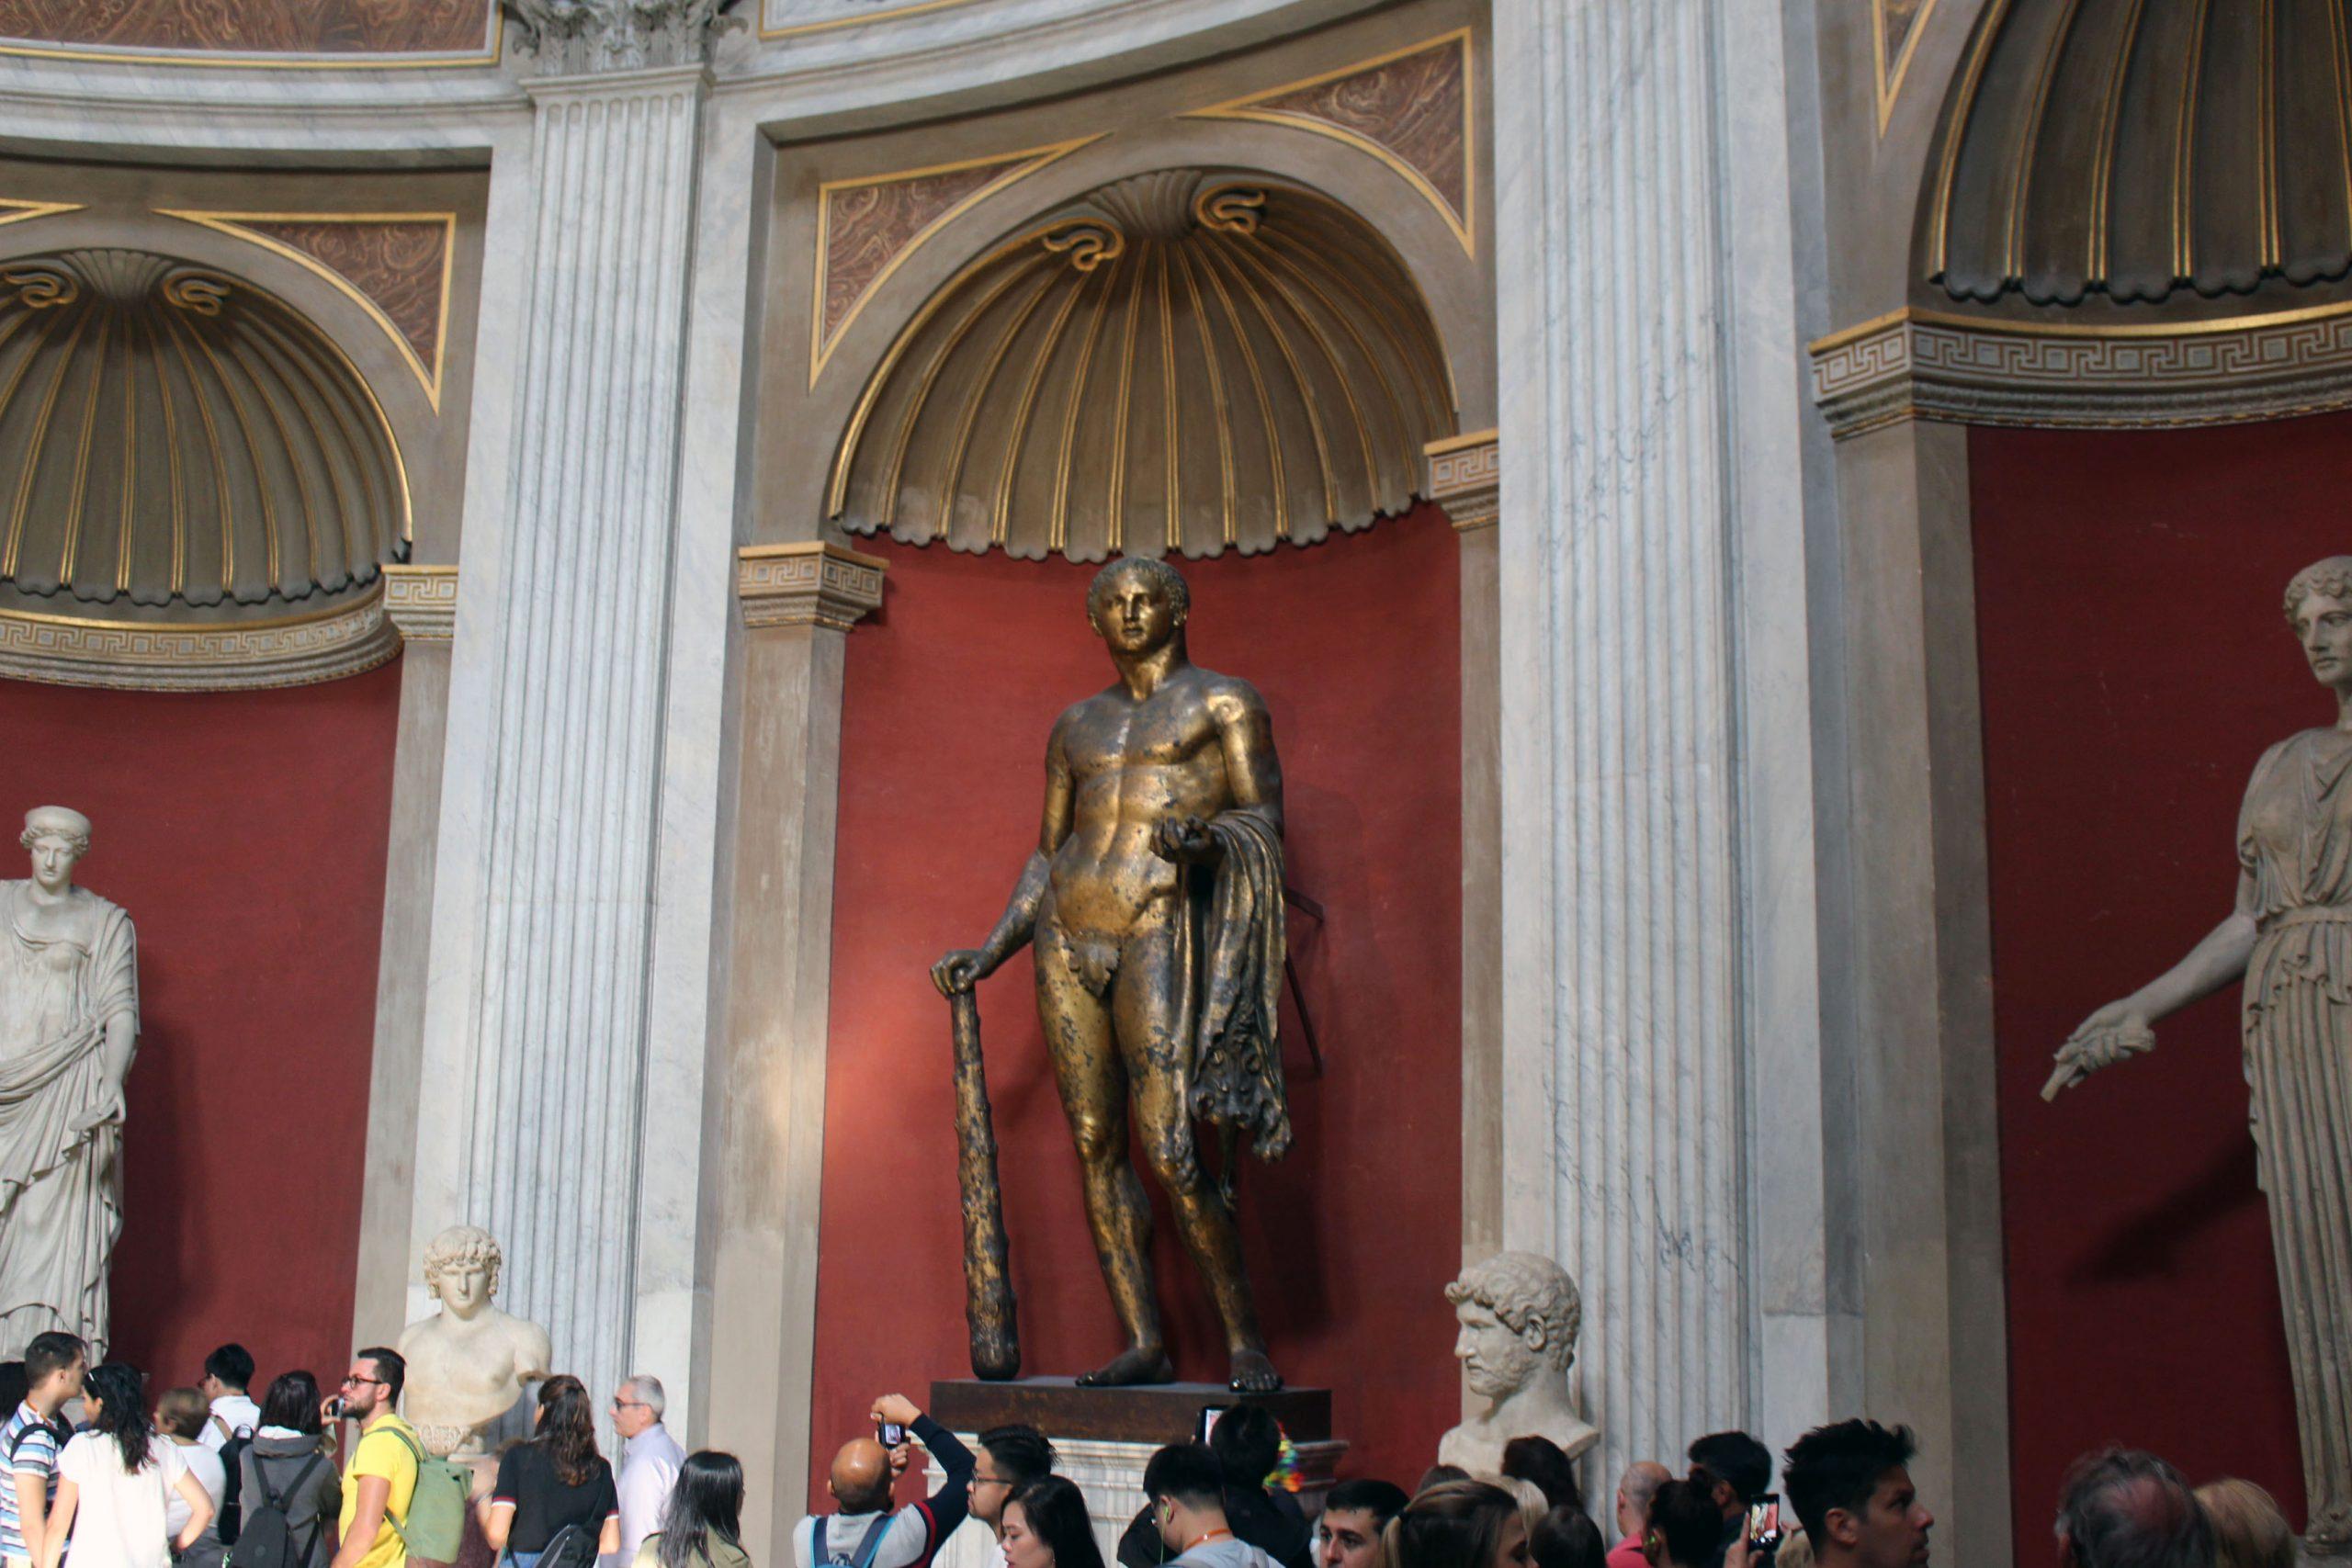 Vatikan_Muzeji_obilazak_Evropski_gradovi_vodicem_akcija_autobusom_Last_minute